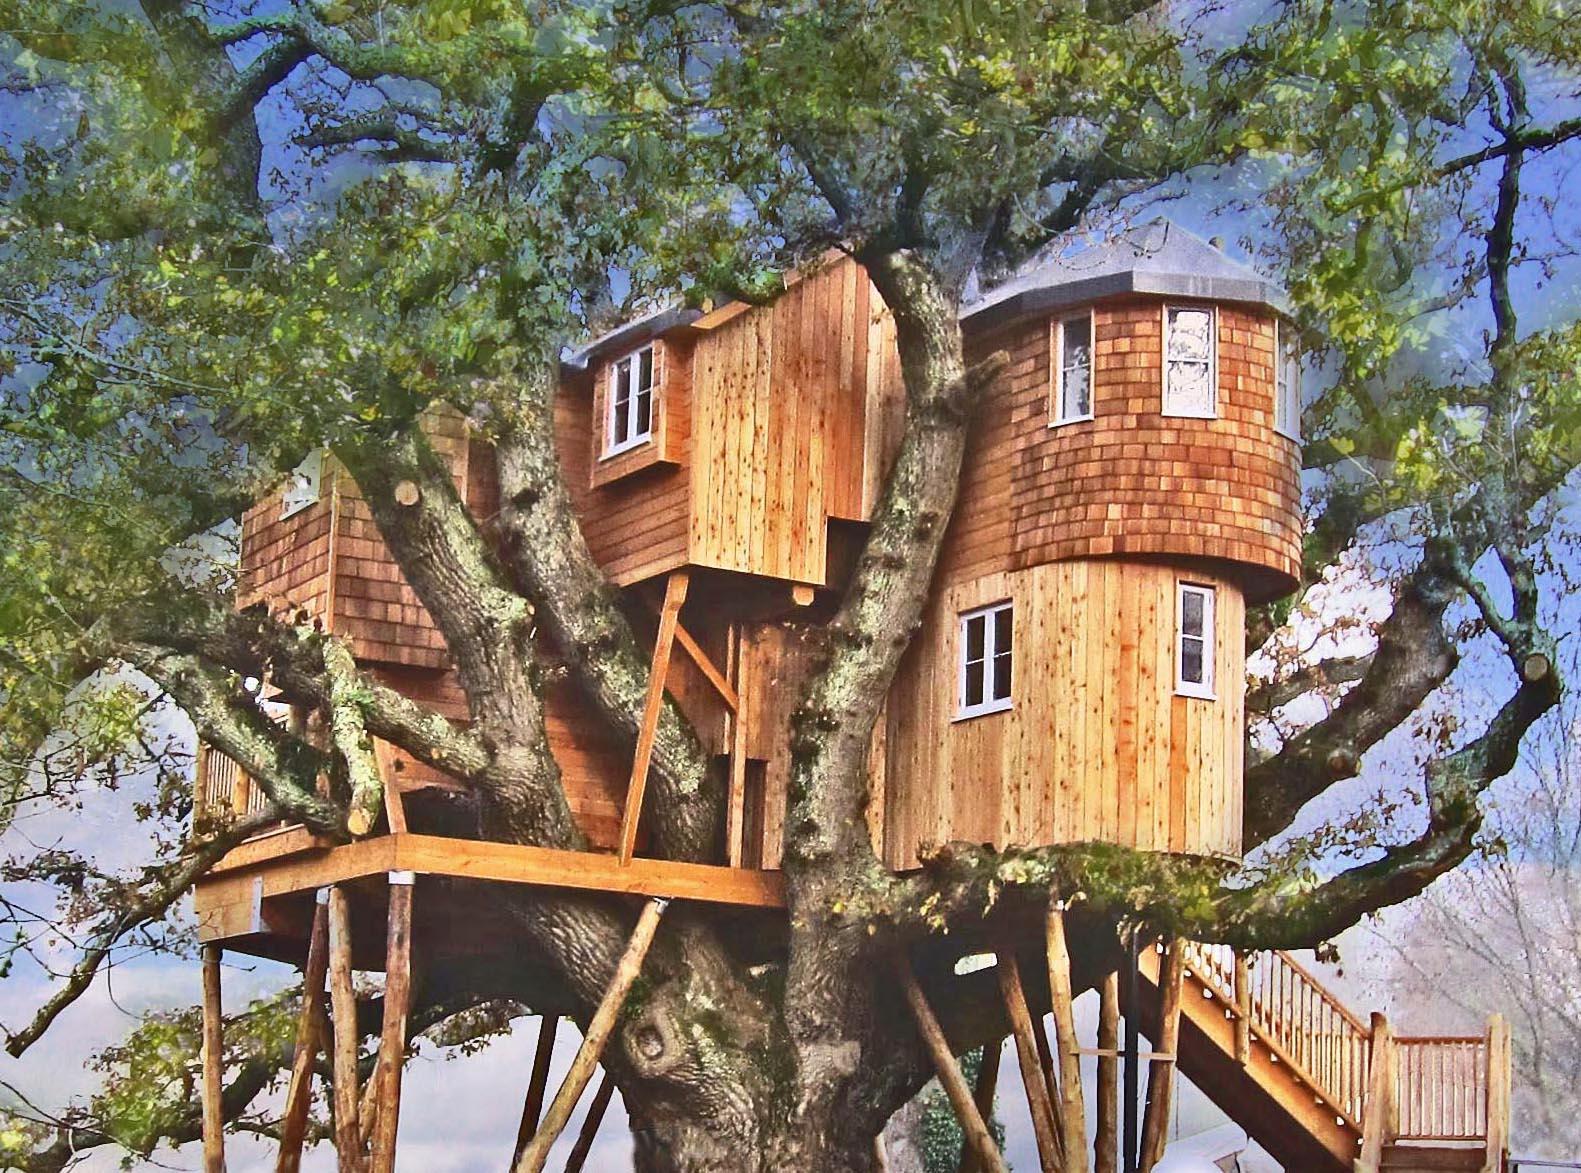 tree house ile ilgili görsel sonucu